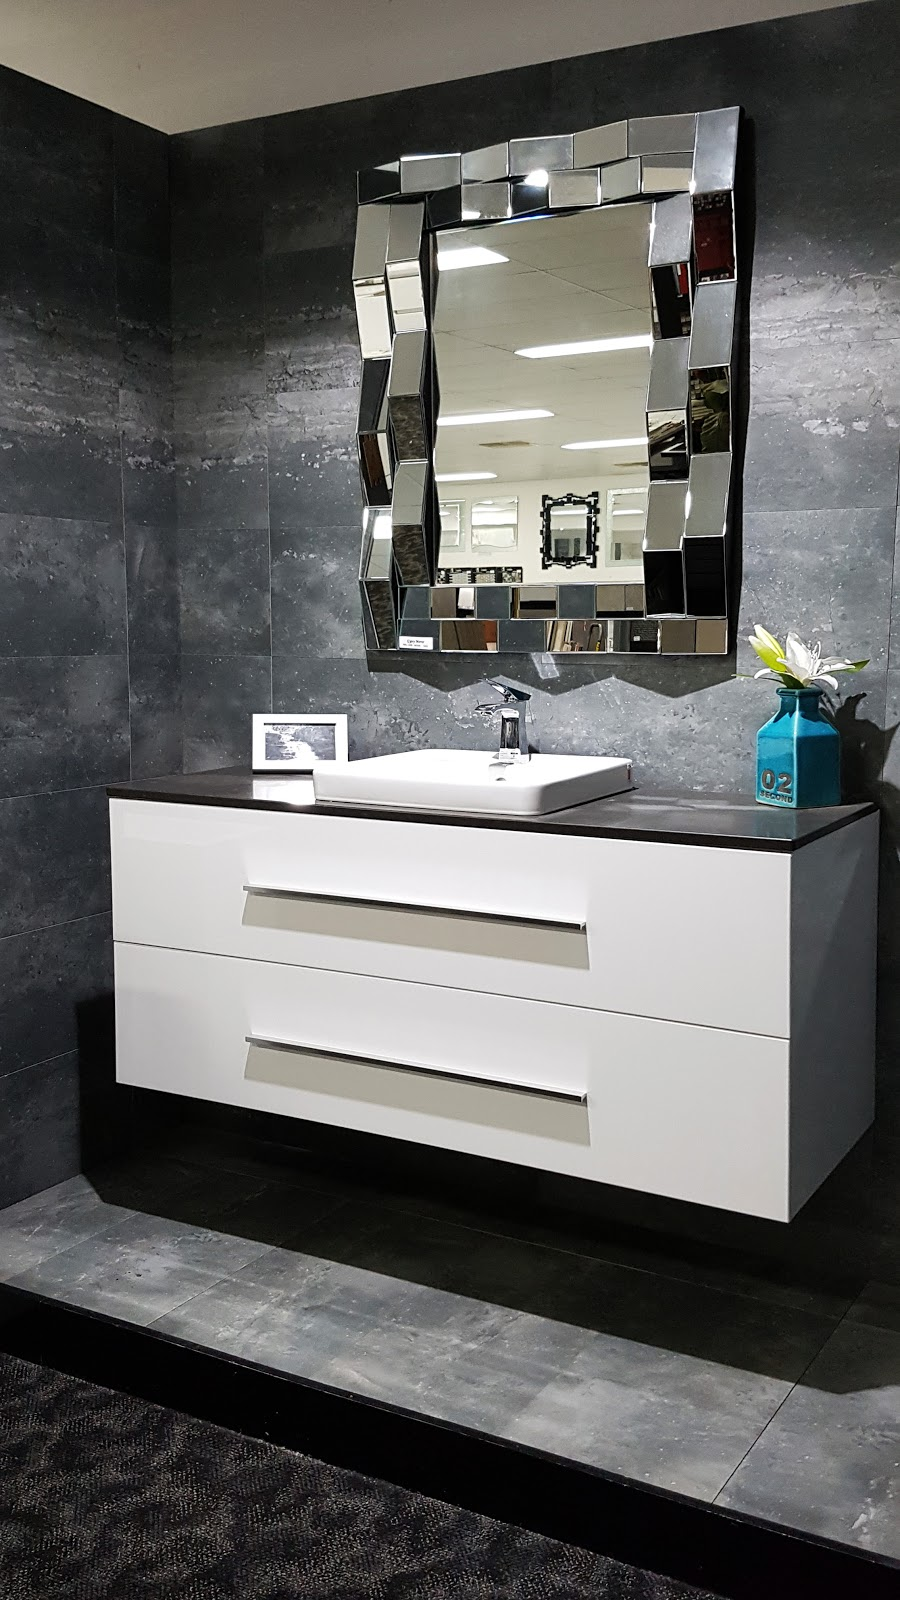 Bathroom Decor Tiles Home Goods Store 51 75 Joondalup Dr Edgewater Wa 6027 Australia